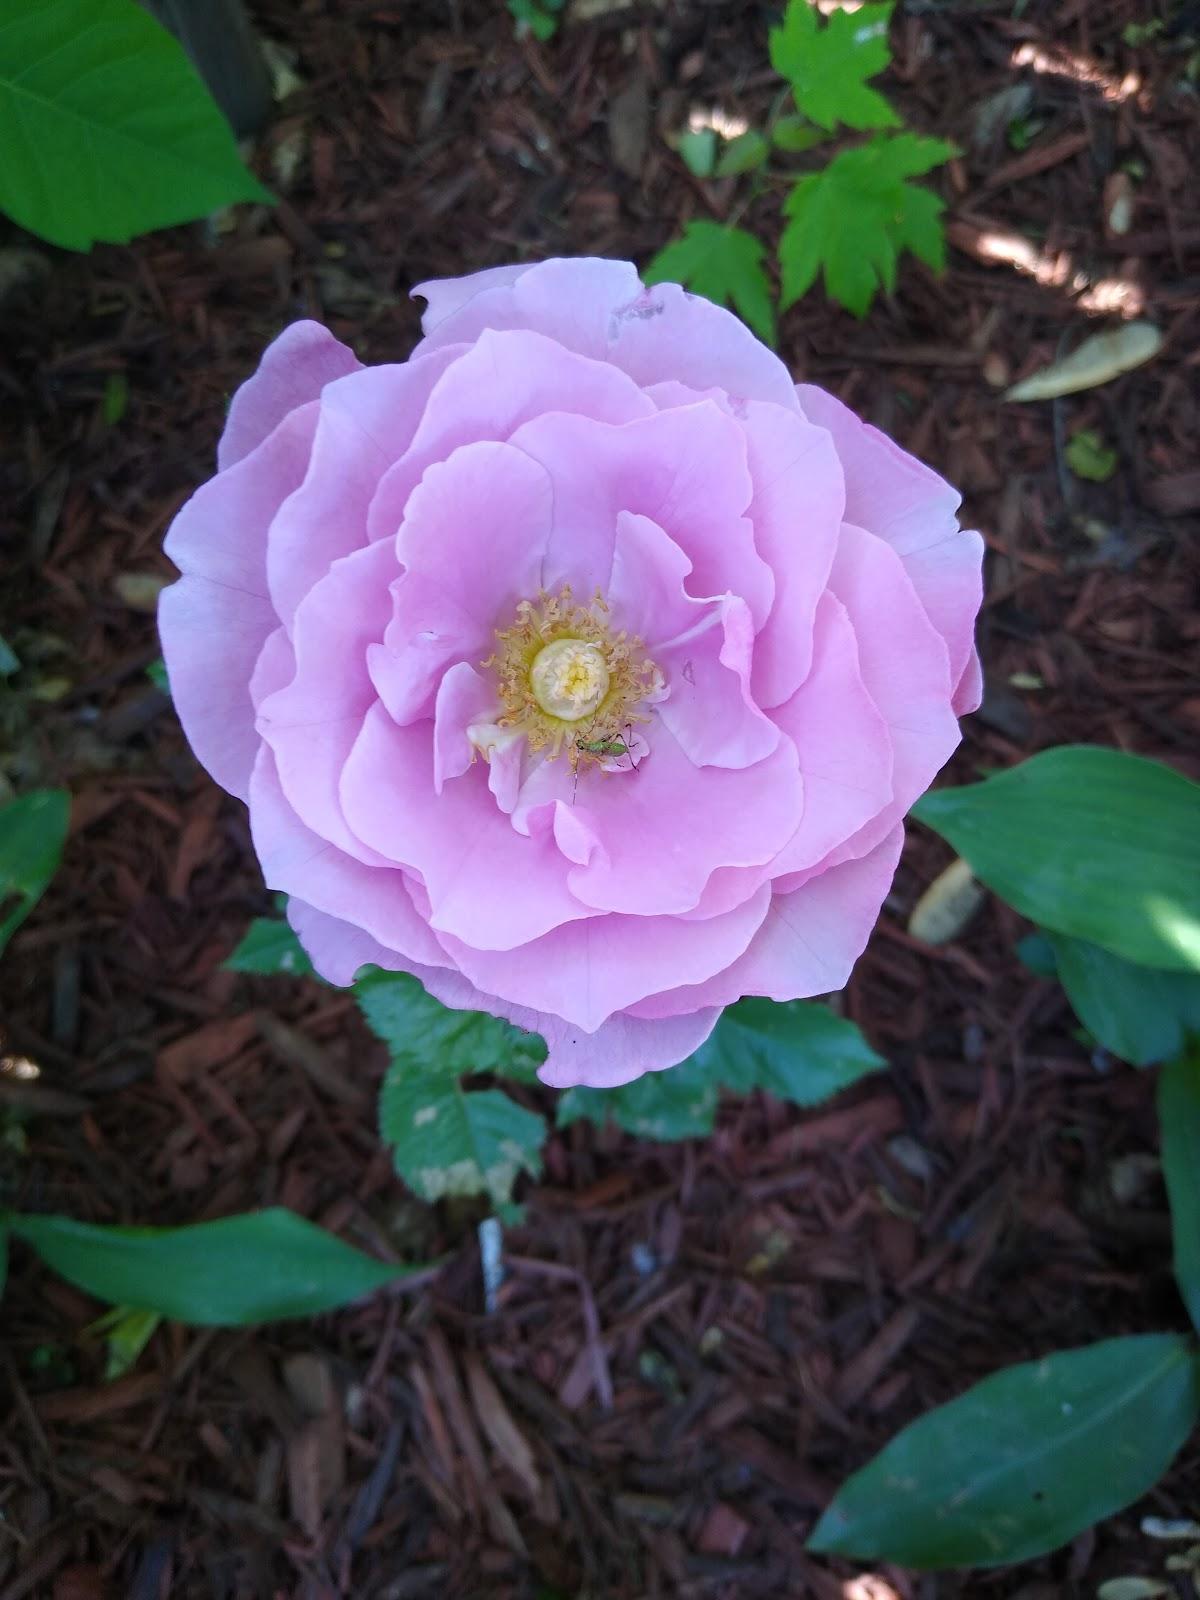 Barbra Streisand rose open picture